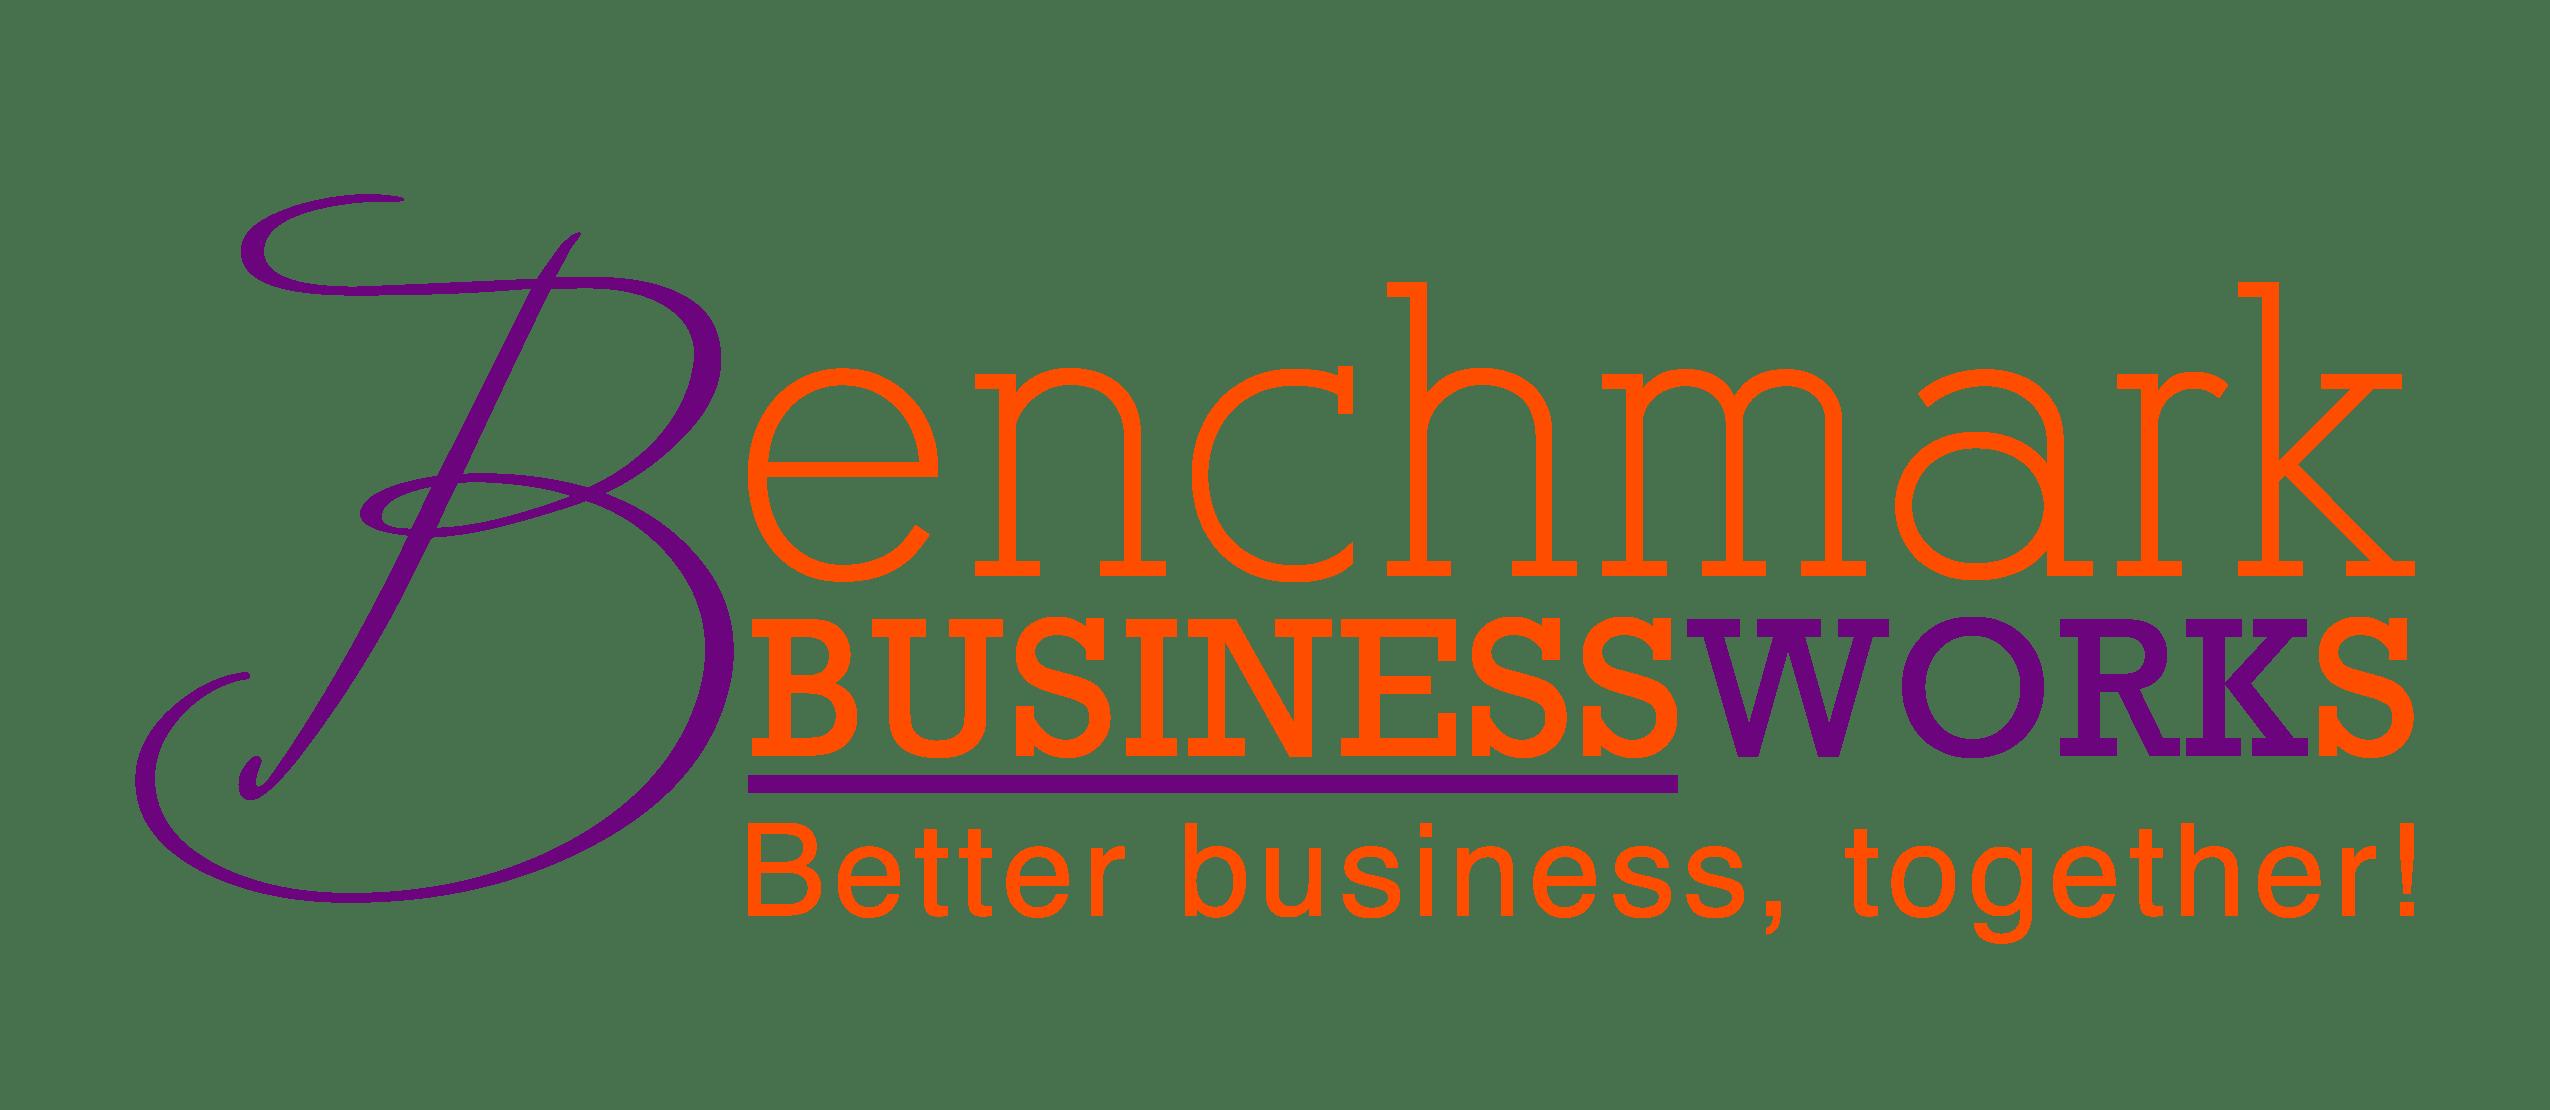 Benchmark Business Works